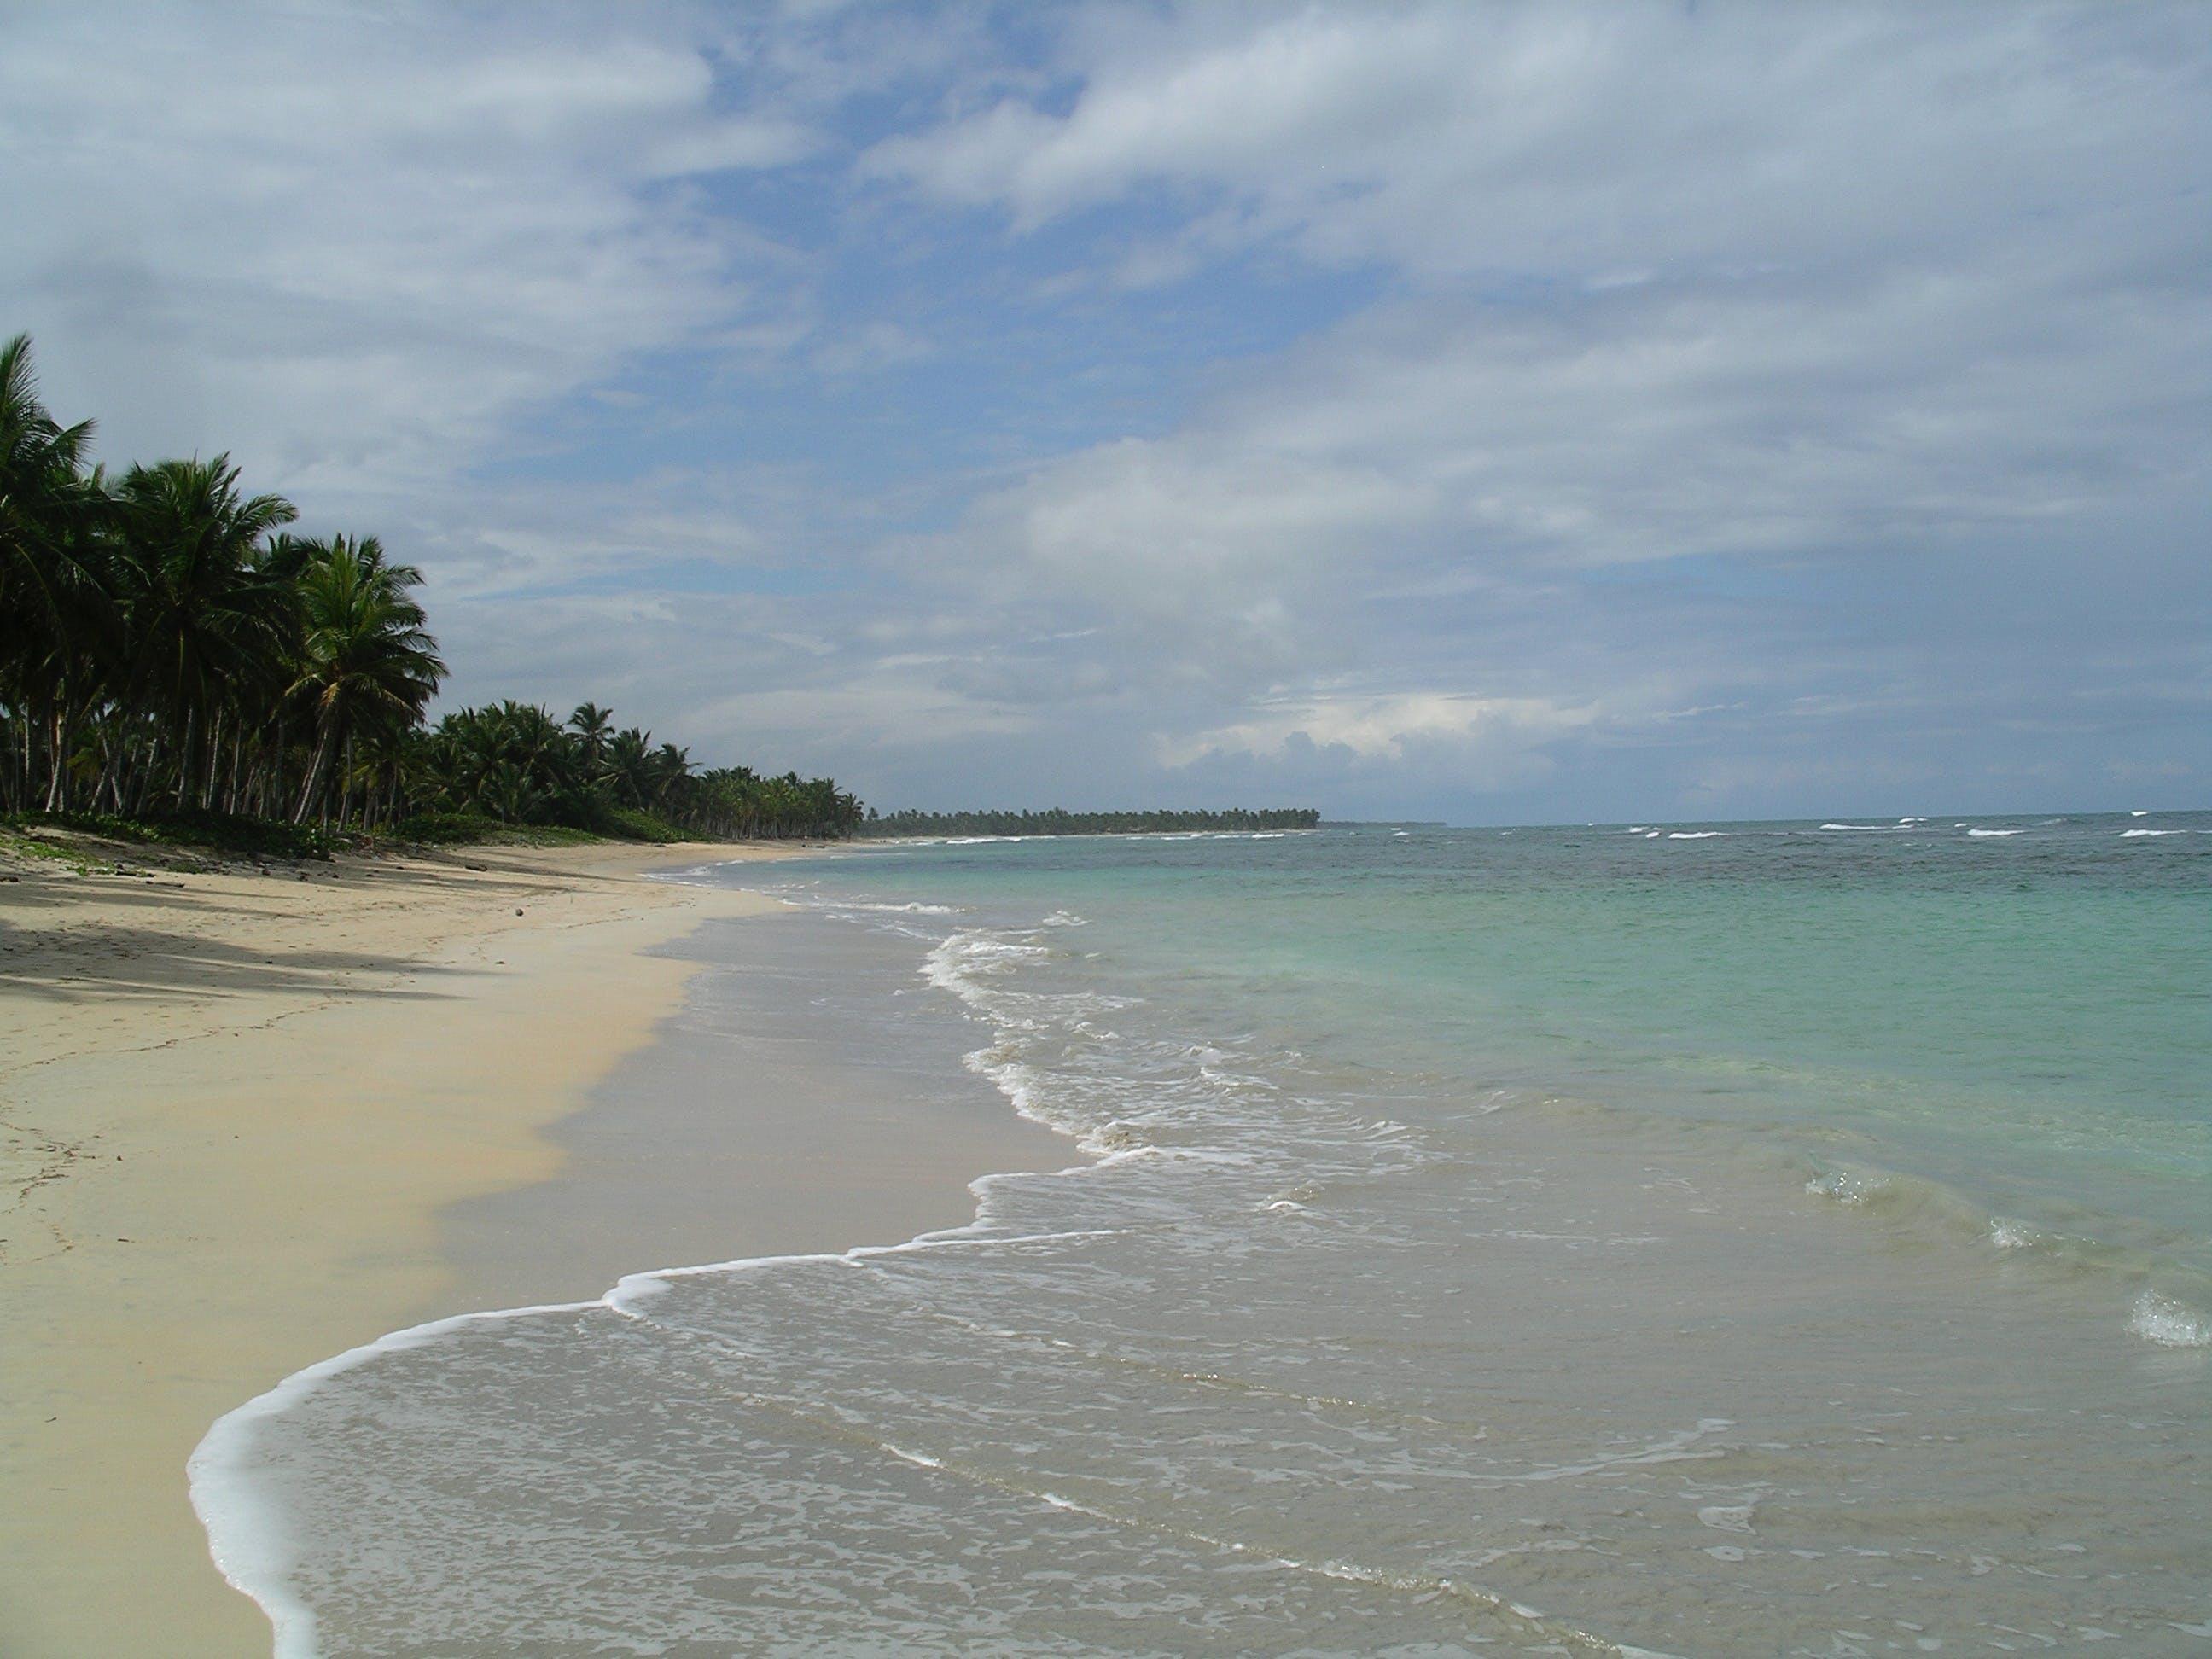 Free stock photo of beach, ocean, palm trees, sand